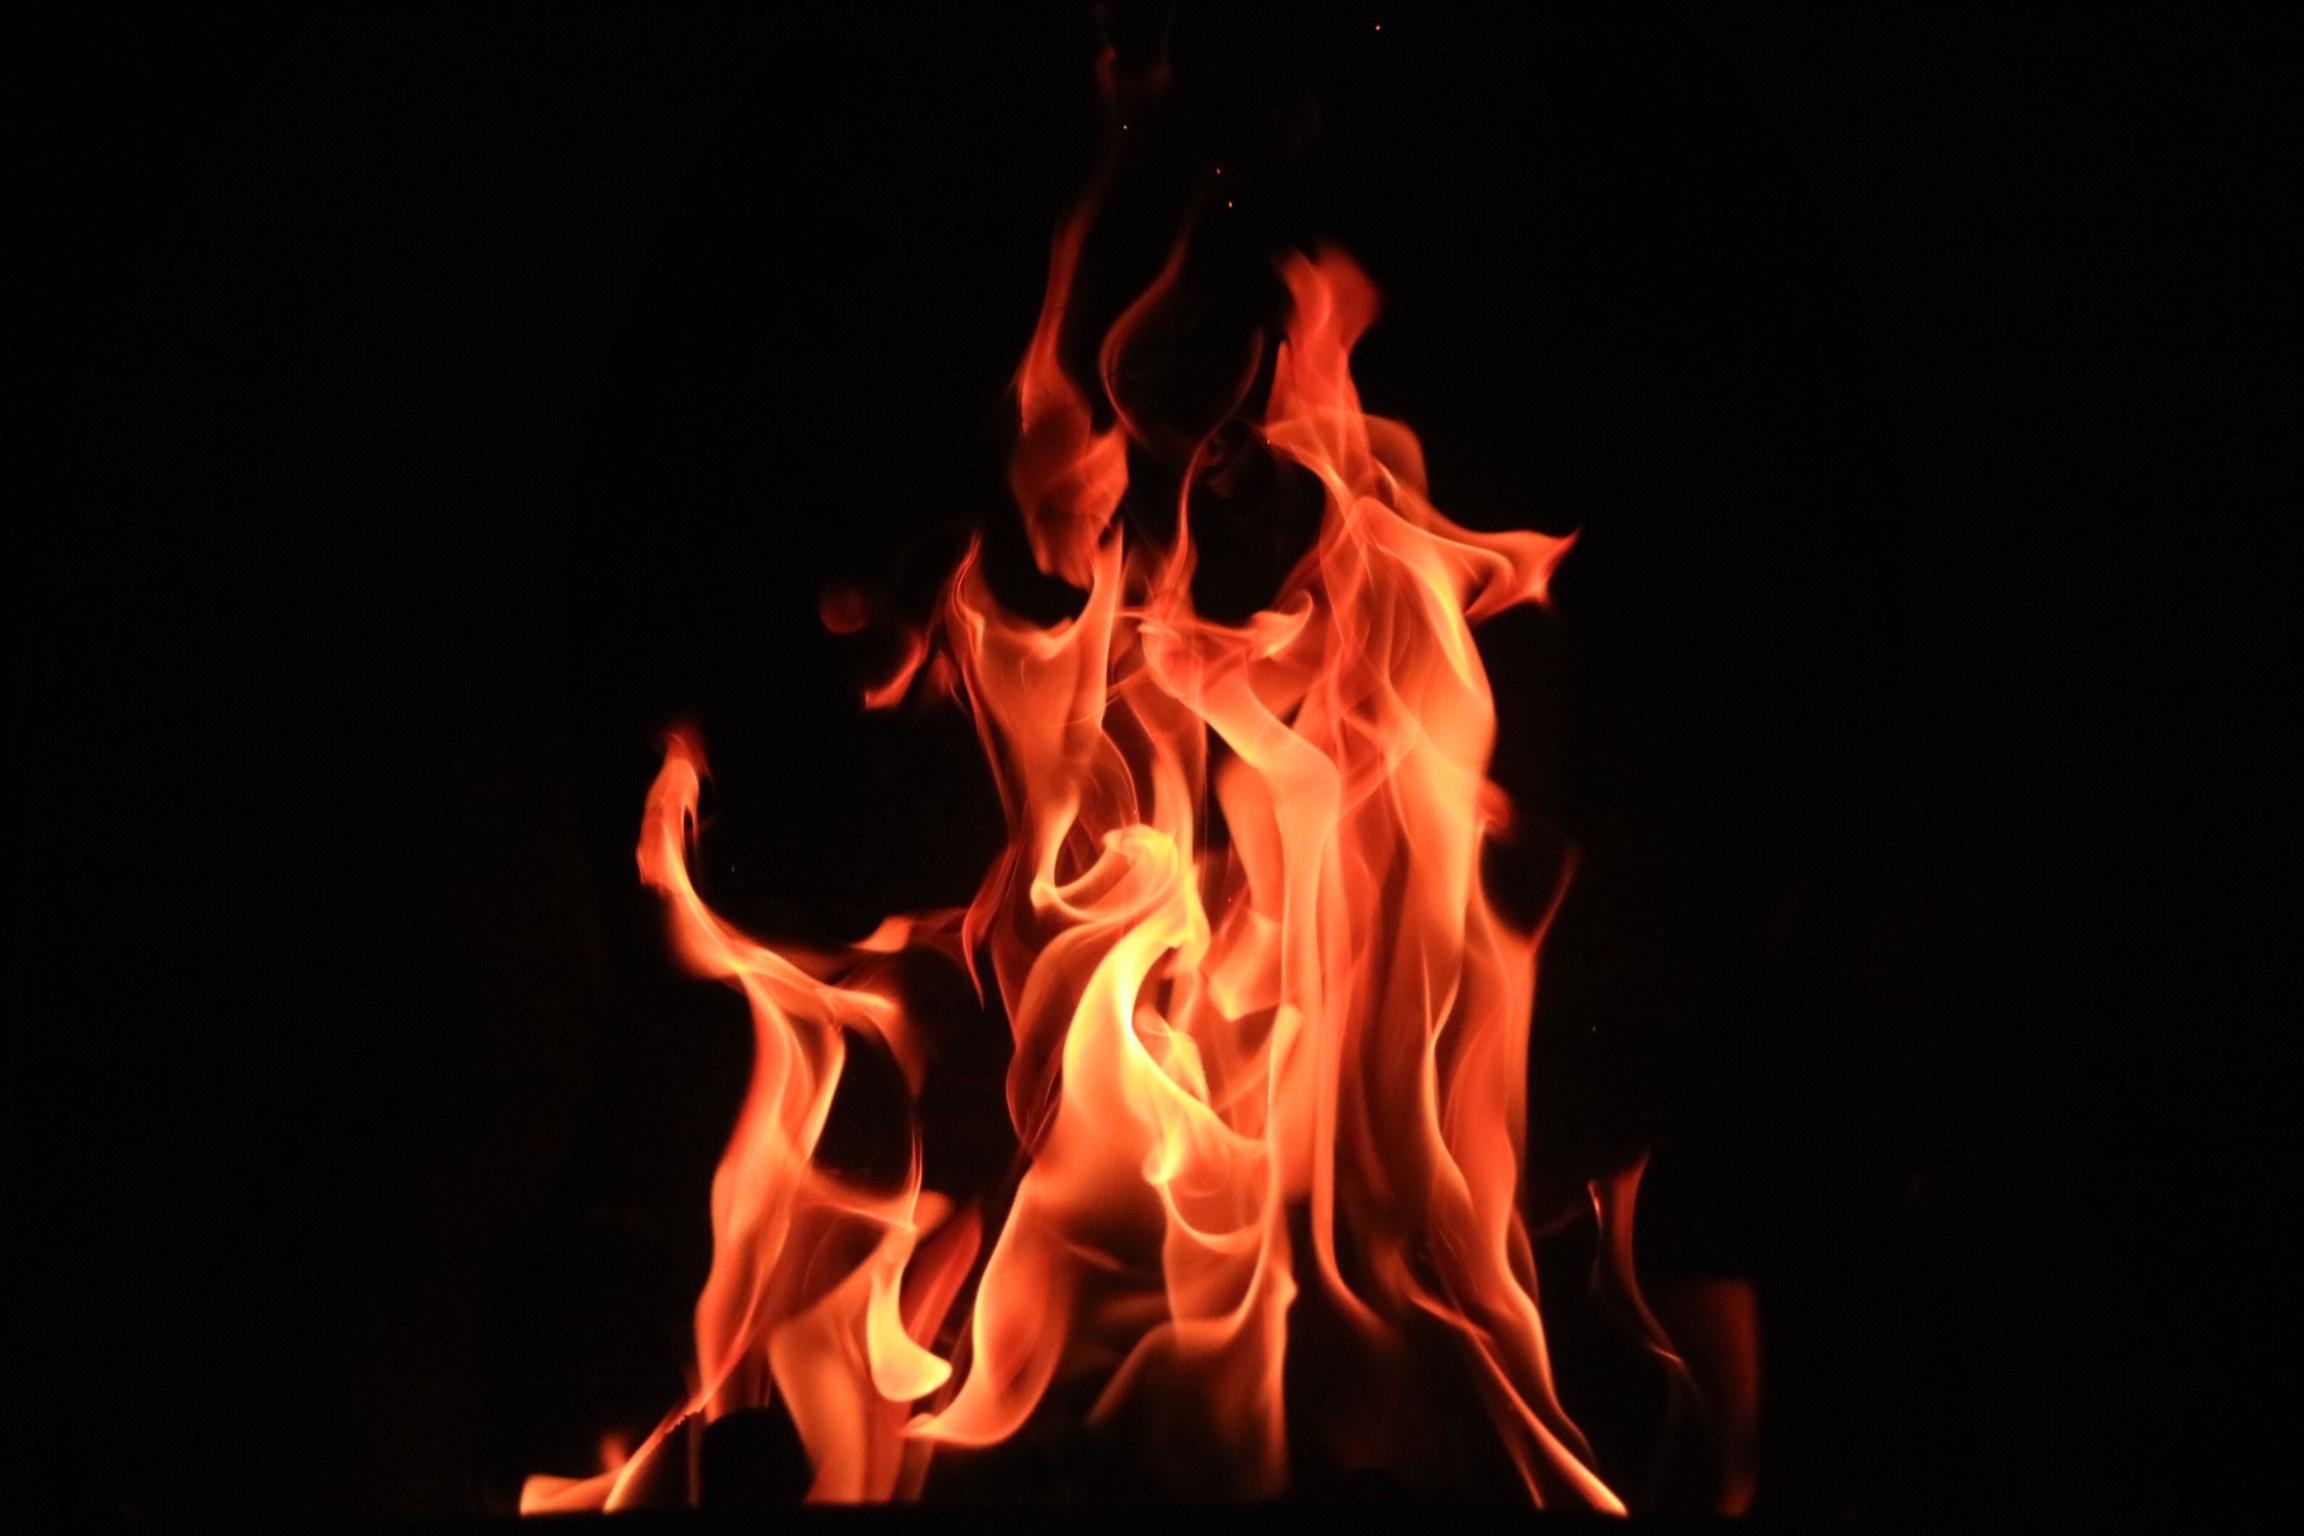 Reflection for Pentecost Sunday